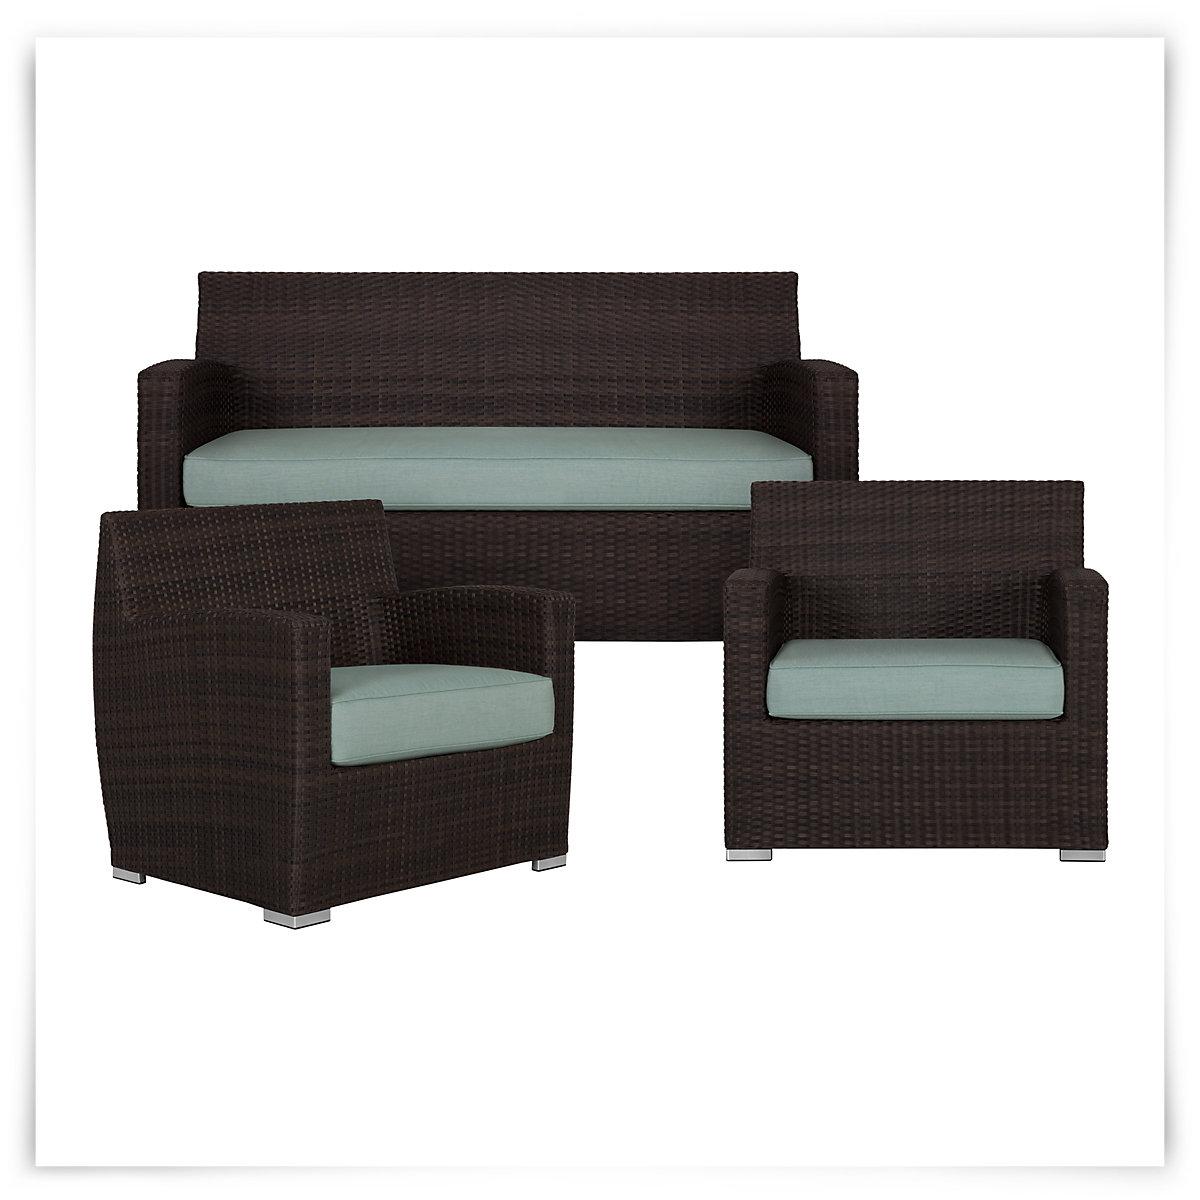 City Furniture Grate Teal Outdoor Living Room Set